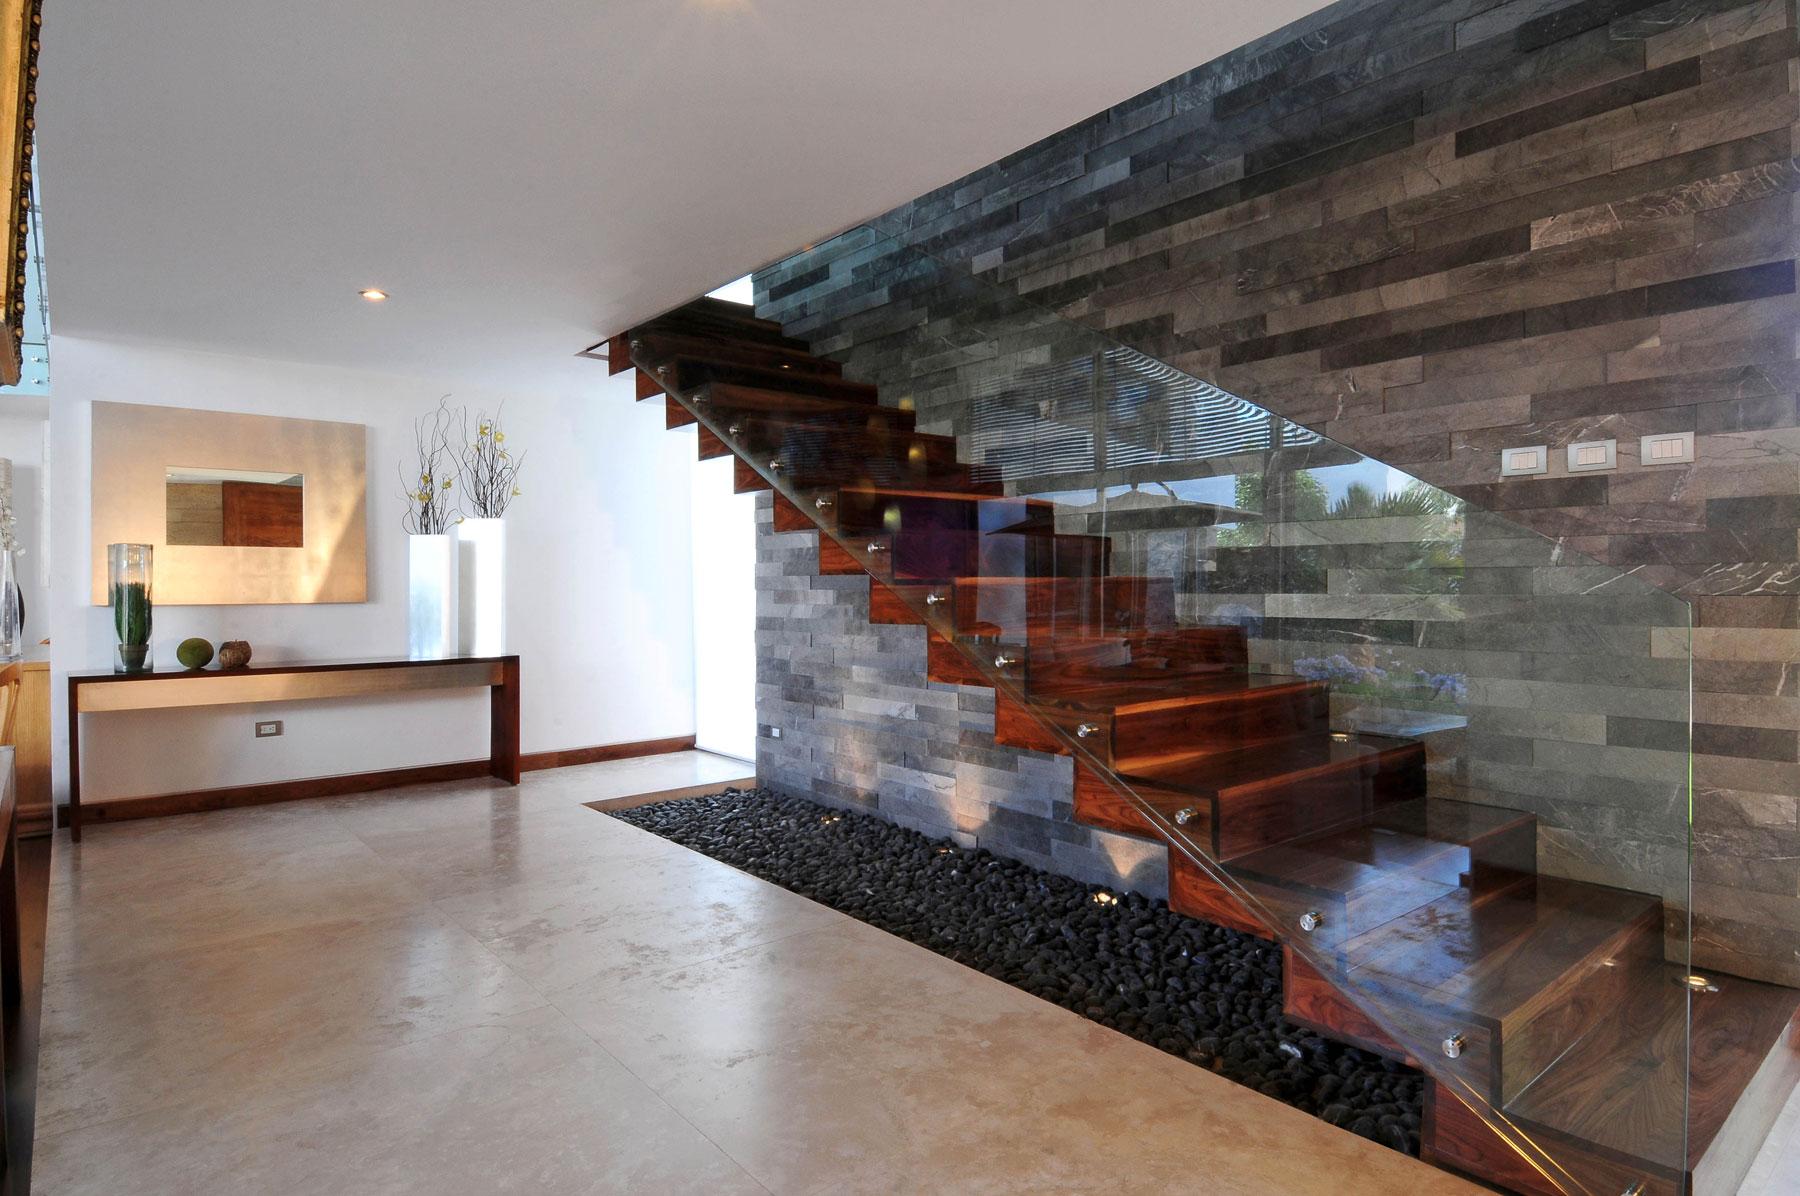 ищете фотоловушку лестница в доме дерево с камнем фото чучела уток